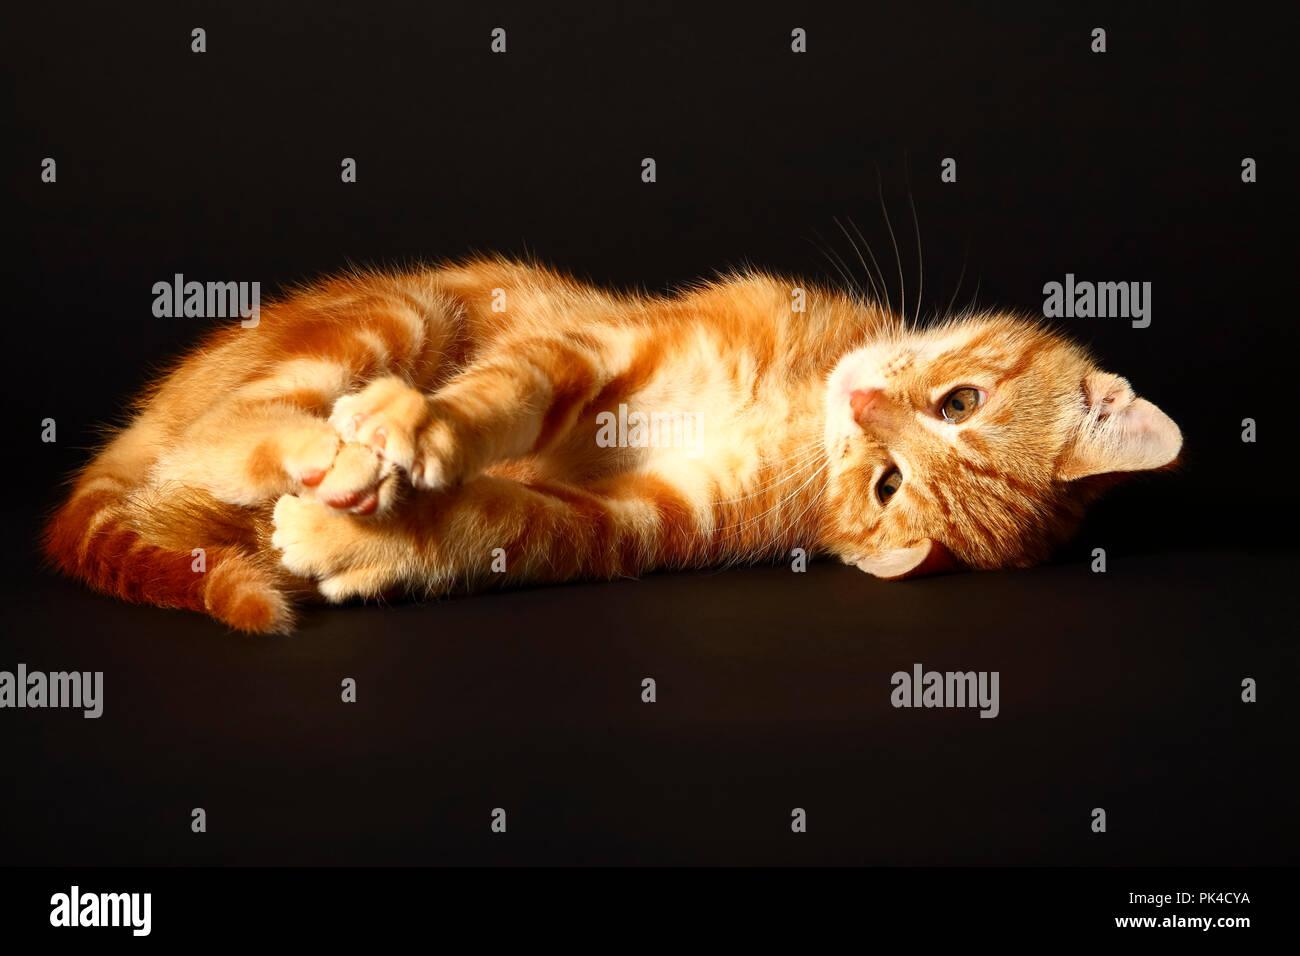 Jengibre mackerel tabby12 semana vieja gatito aislado en un fondo negro Foto de stock